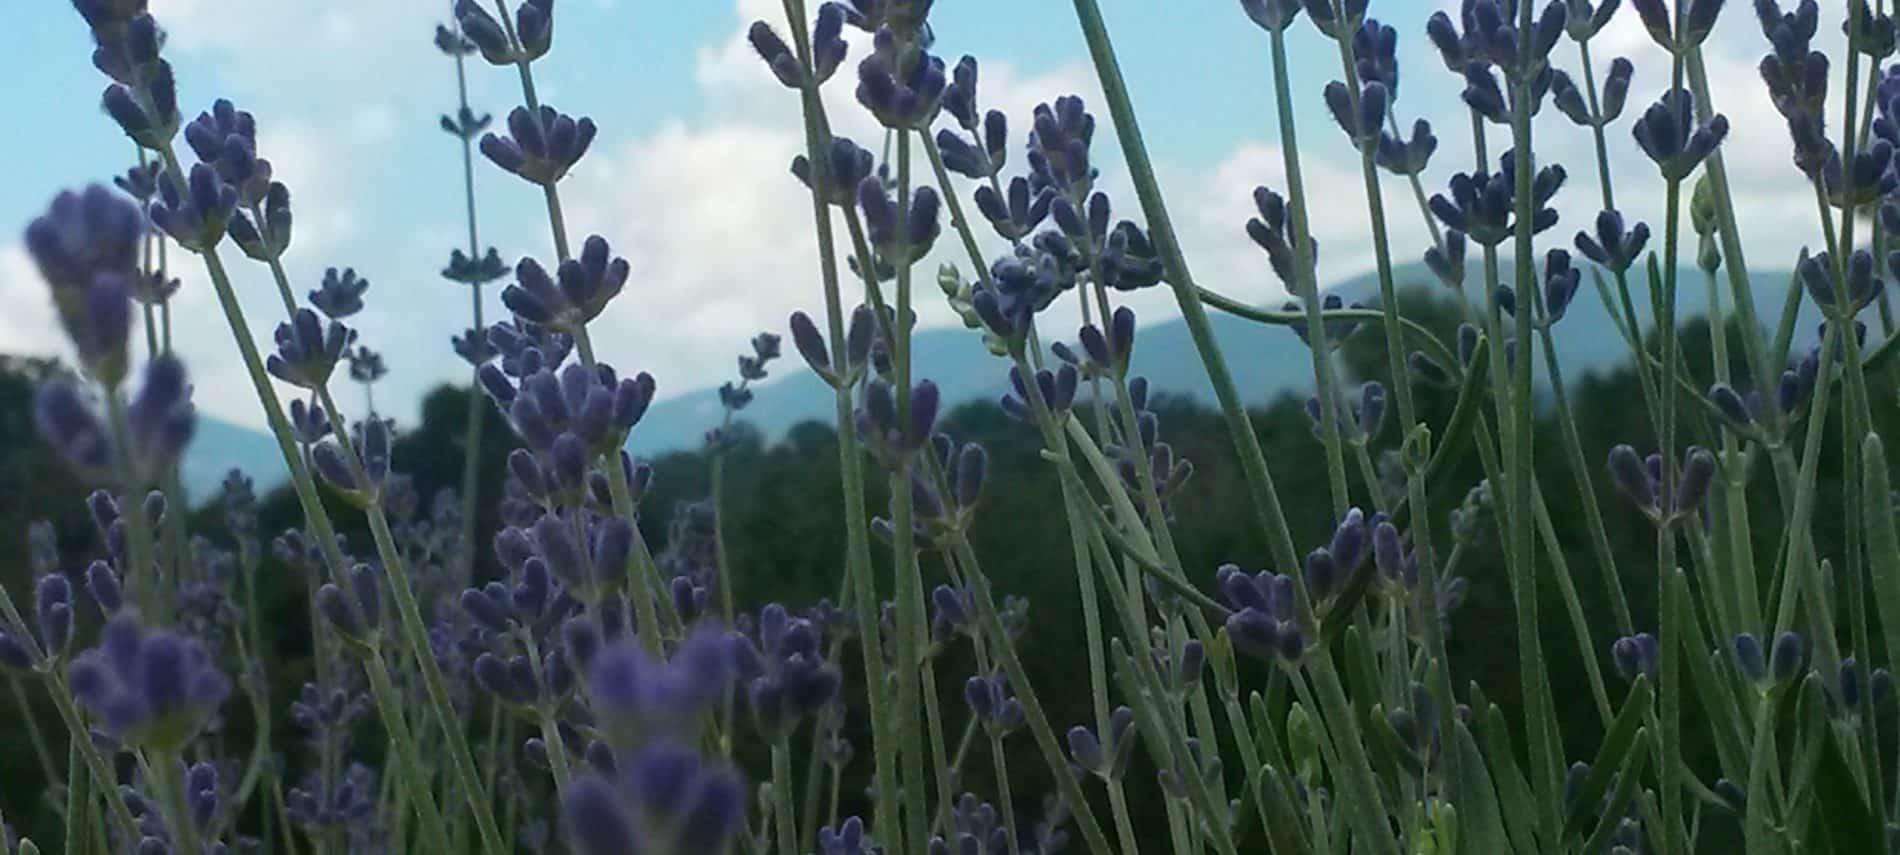 a field of lavender in bloom.